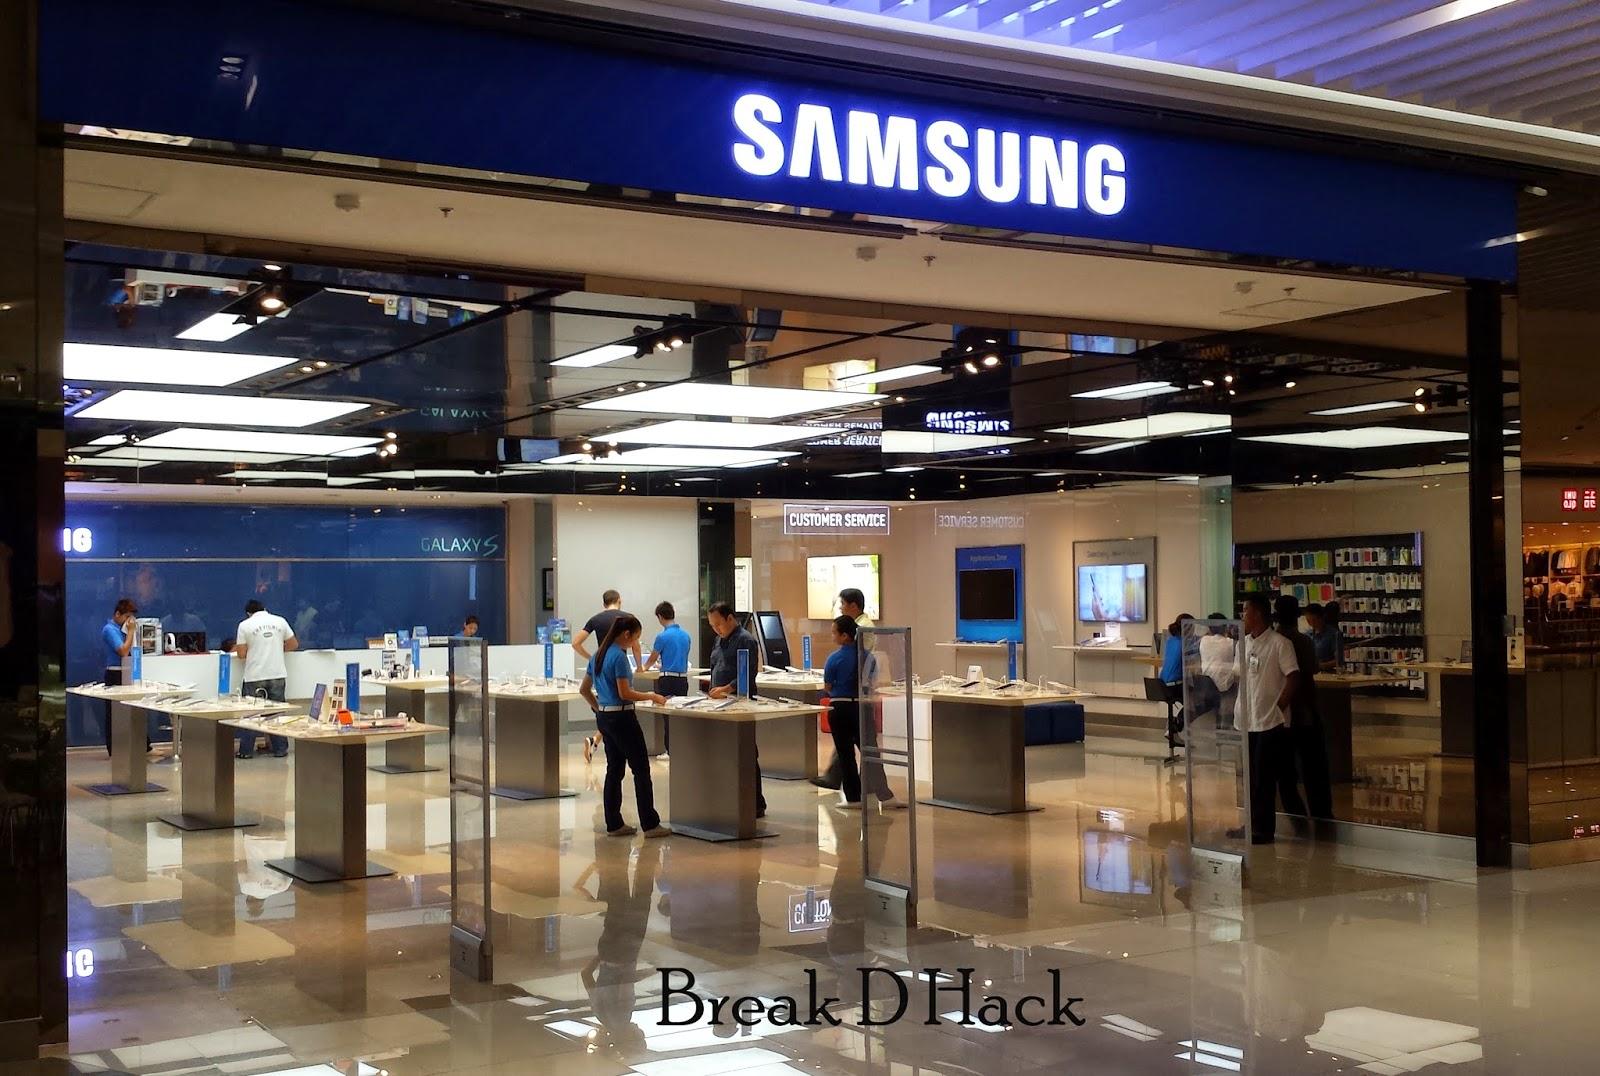 Samsung Tizen Powered Smartphones To Release In India Soon